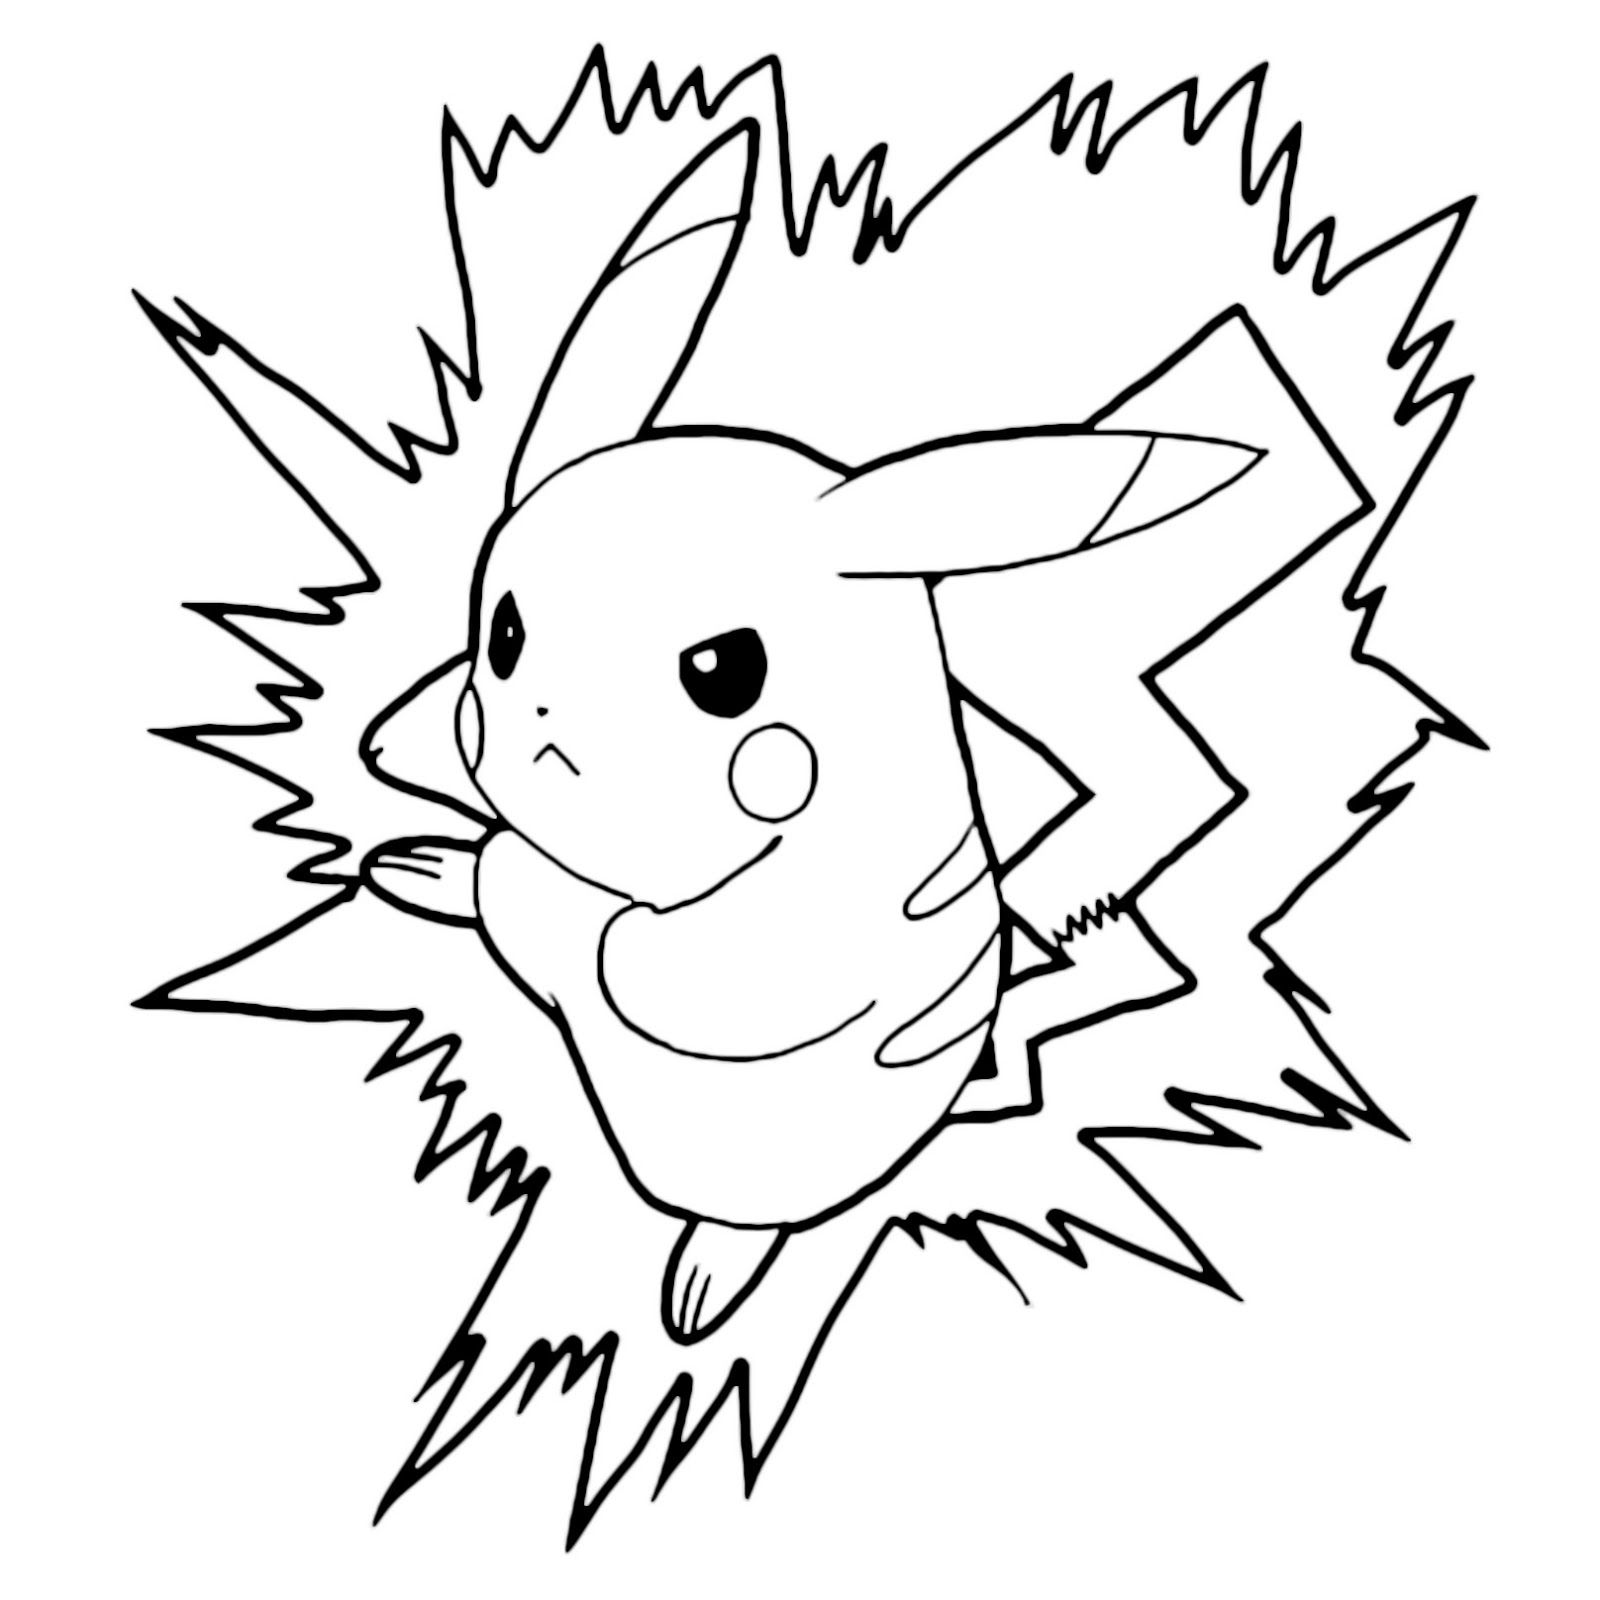 Angry Pokemon Pikachu Lightning Bolt Attack Coloring Pages Pokemon Coloring Pages Pikachu Coloring Page Pokemon Coloring Sheets